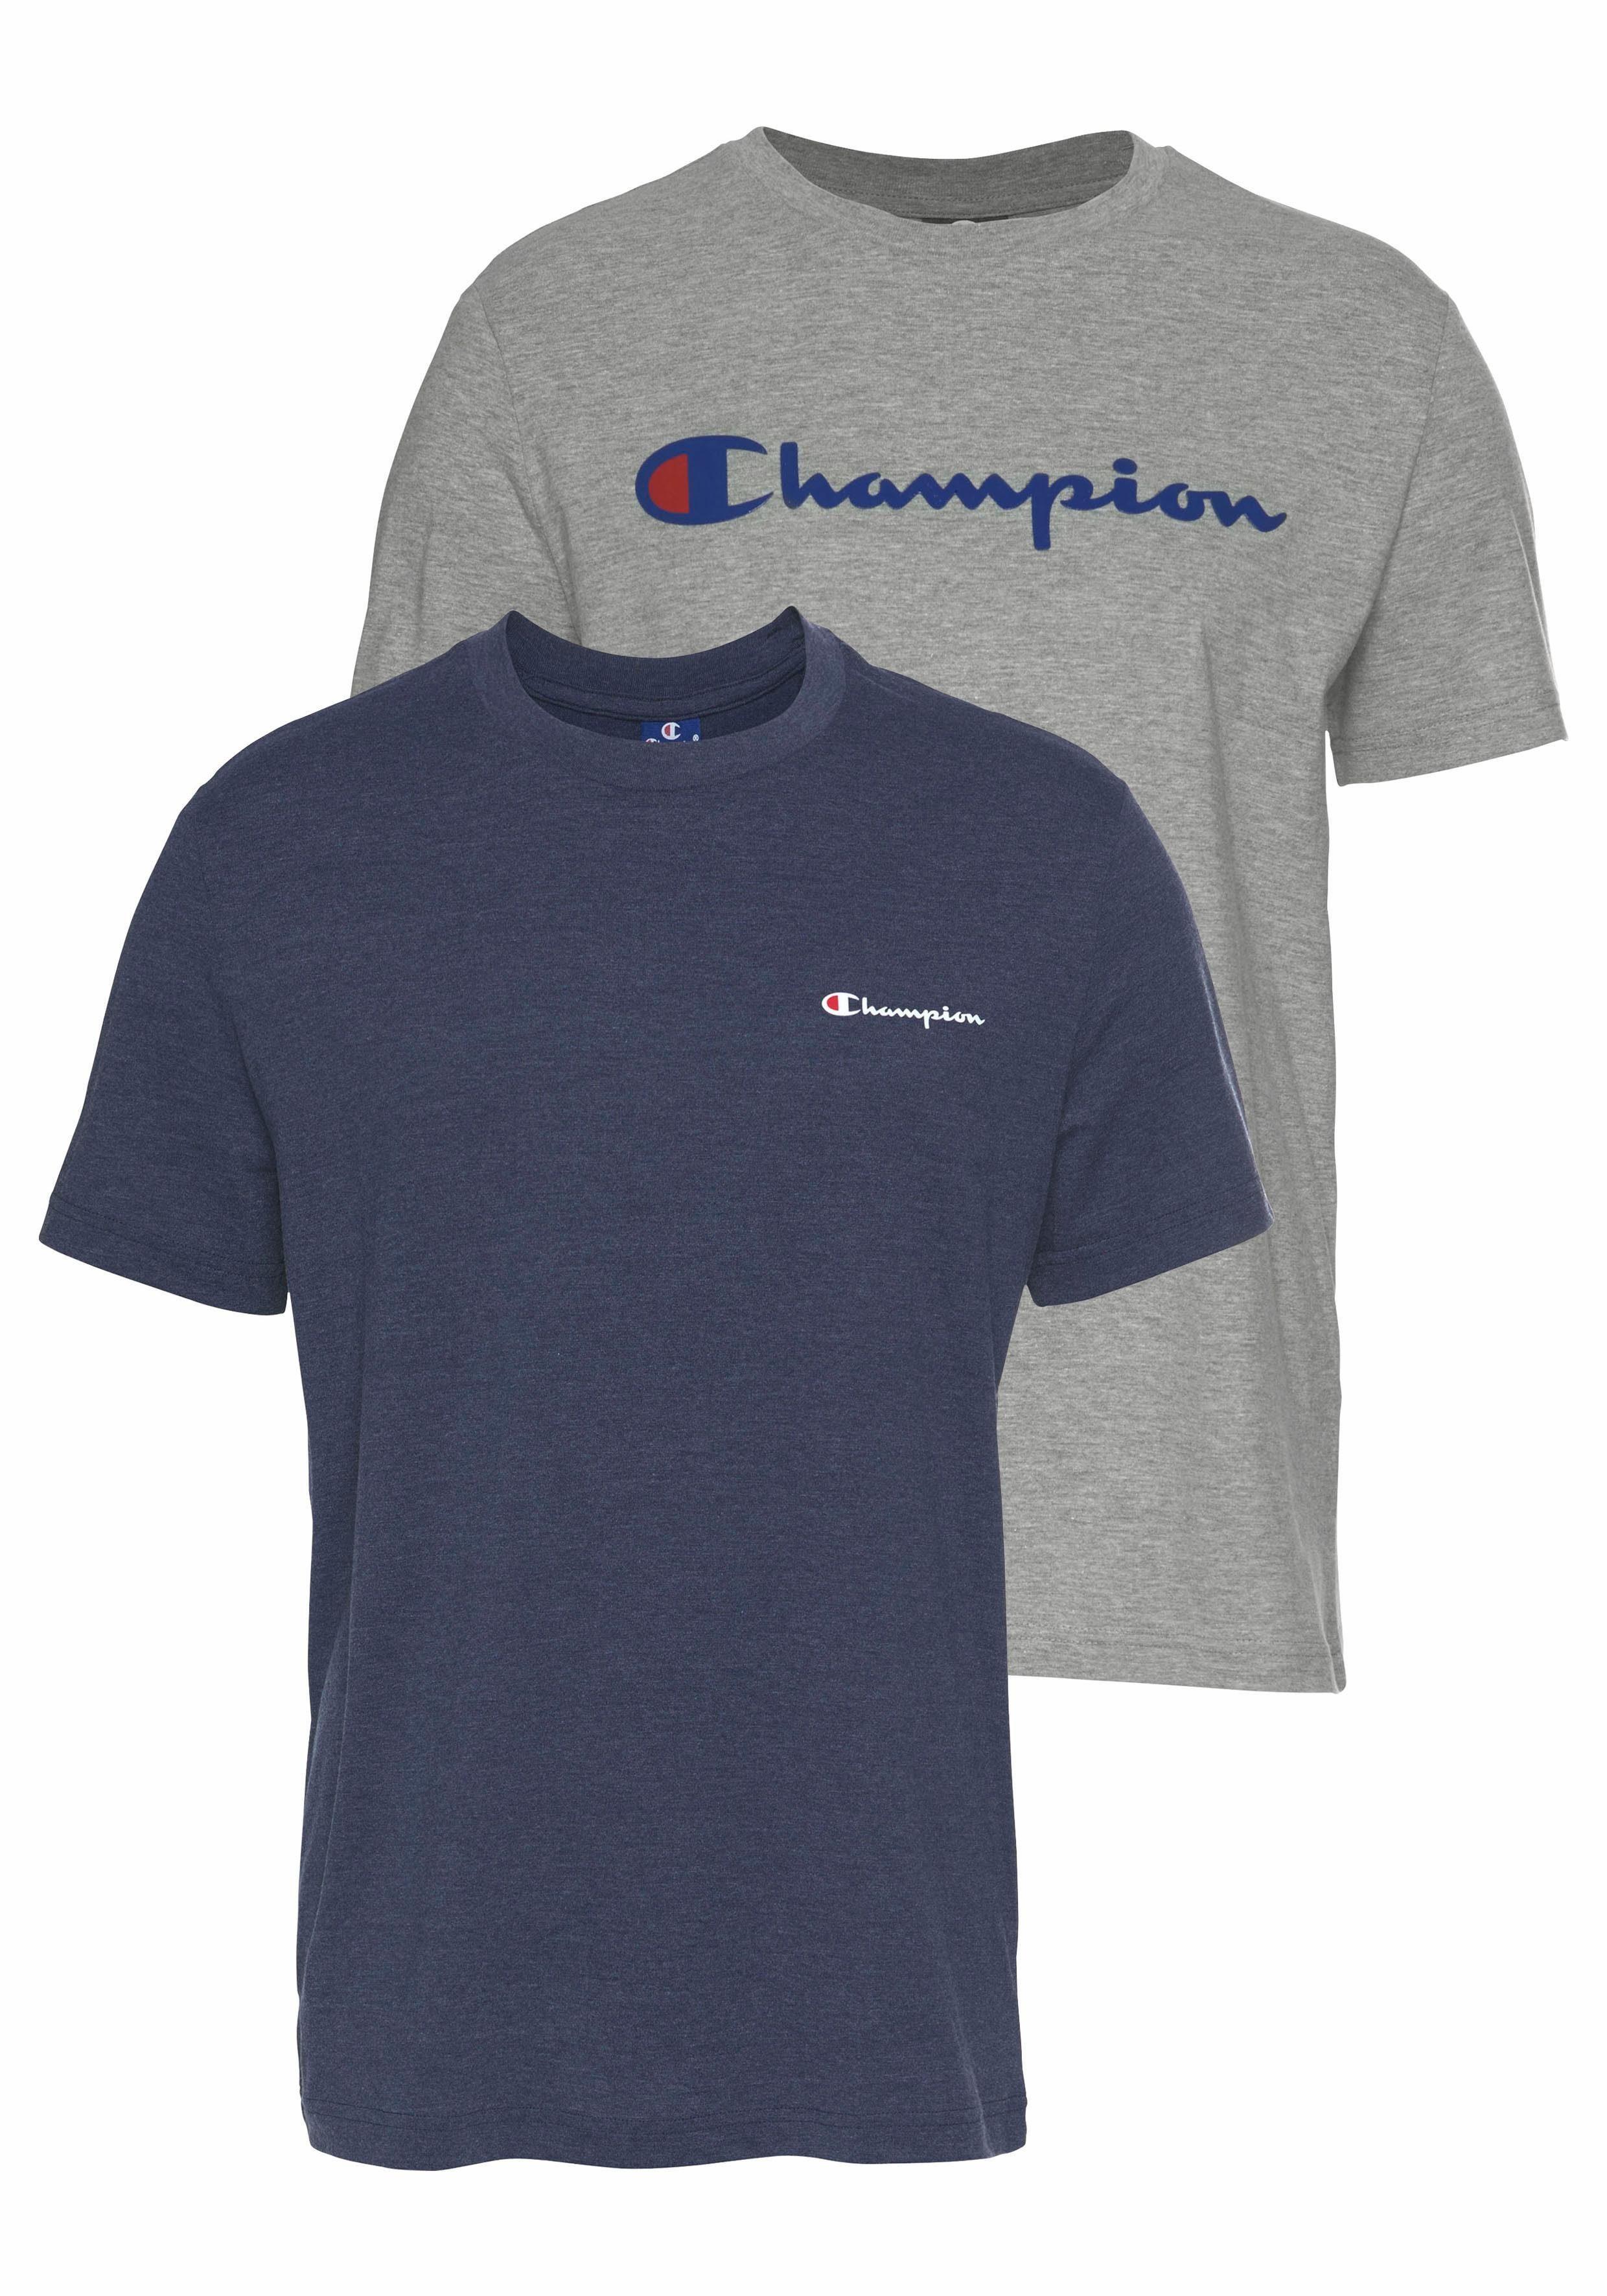 champions t shirt blau